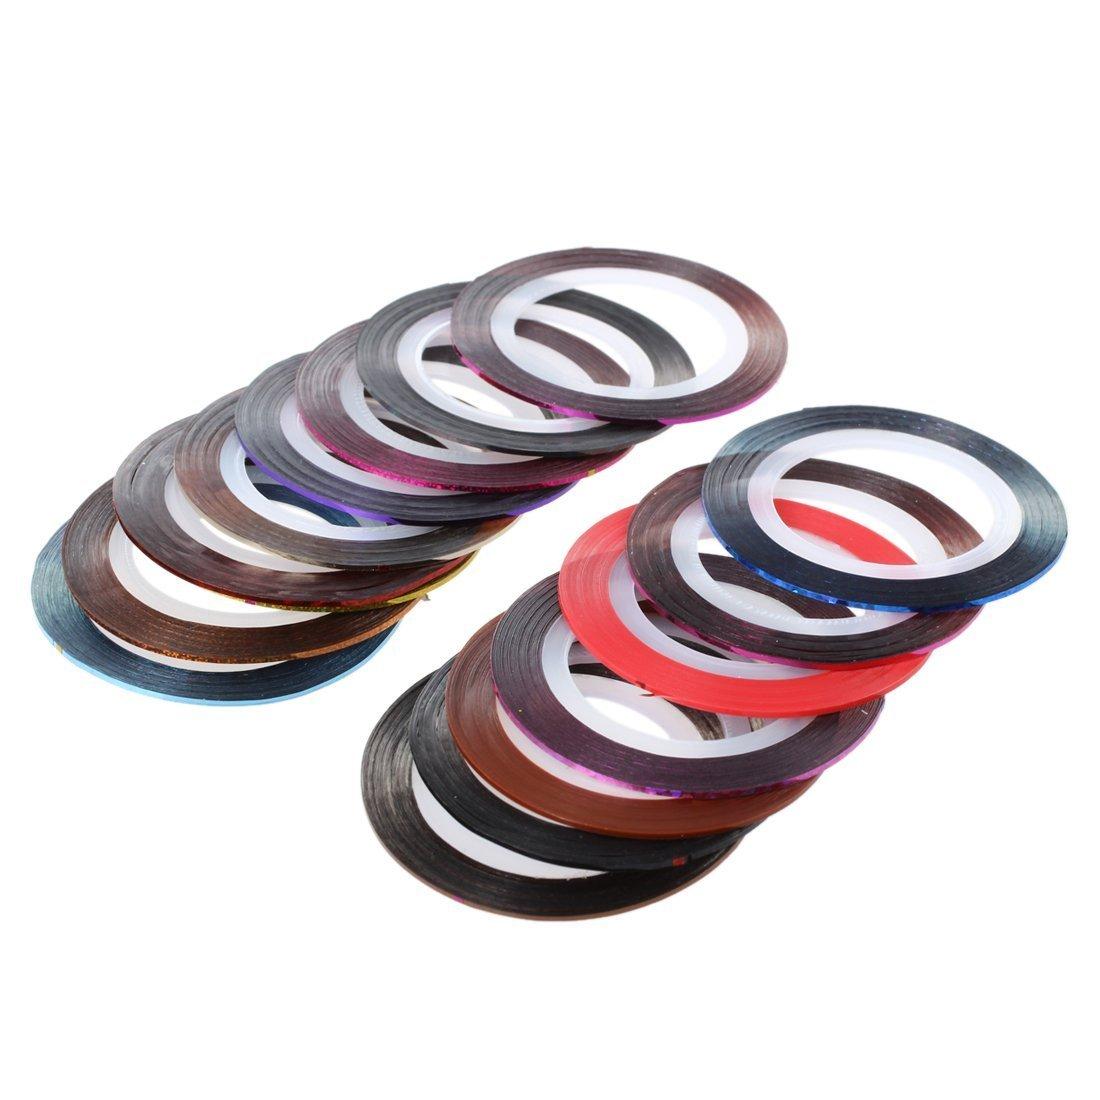 SODIAL(R) 18 Rolls Nail Art UV Gel Tips Striping Tape Line Sticker Decoration